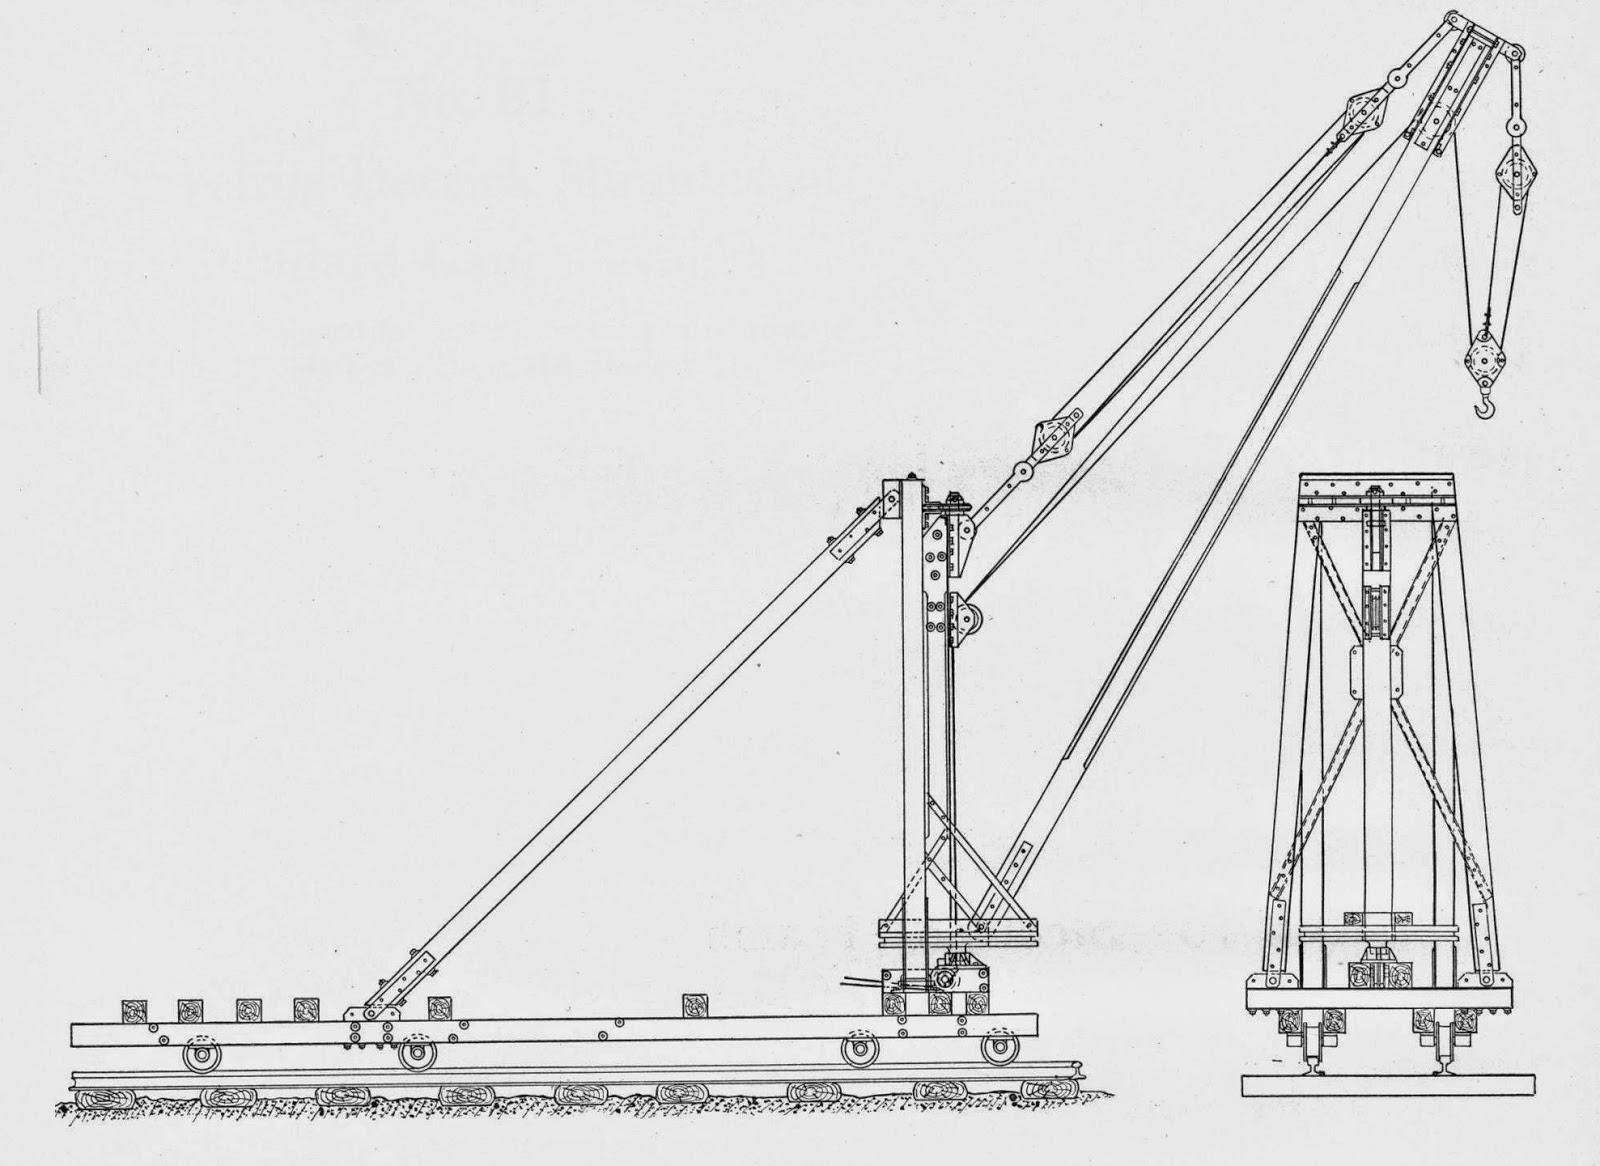 Model Railroad Minutiae Hoists And Derricks